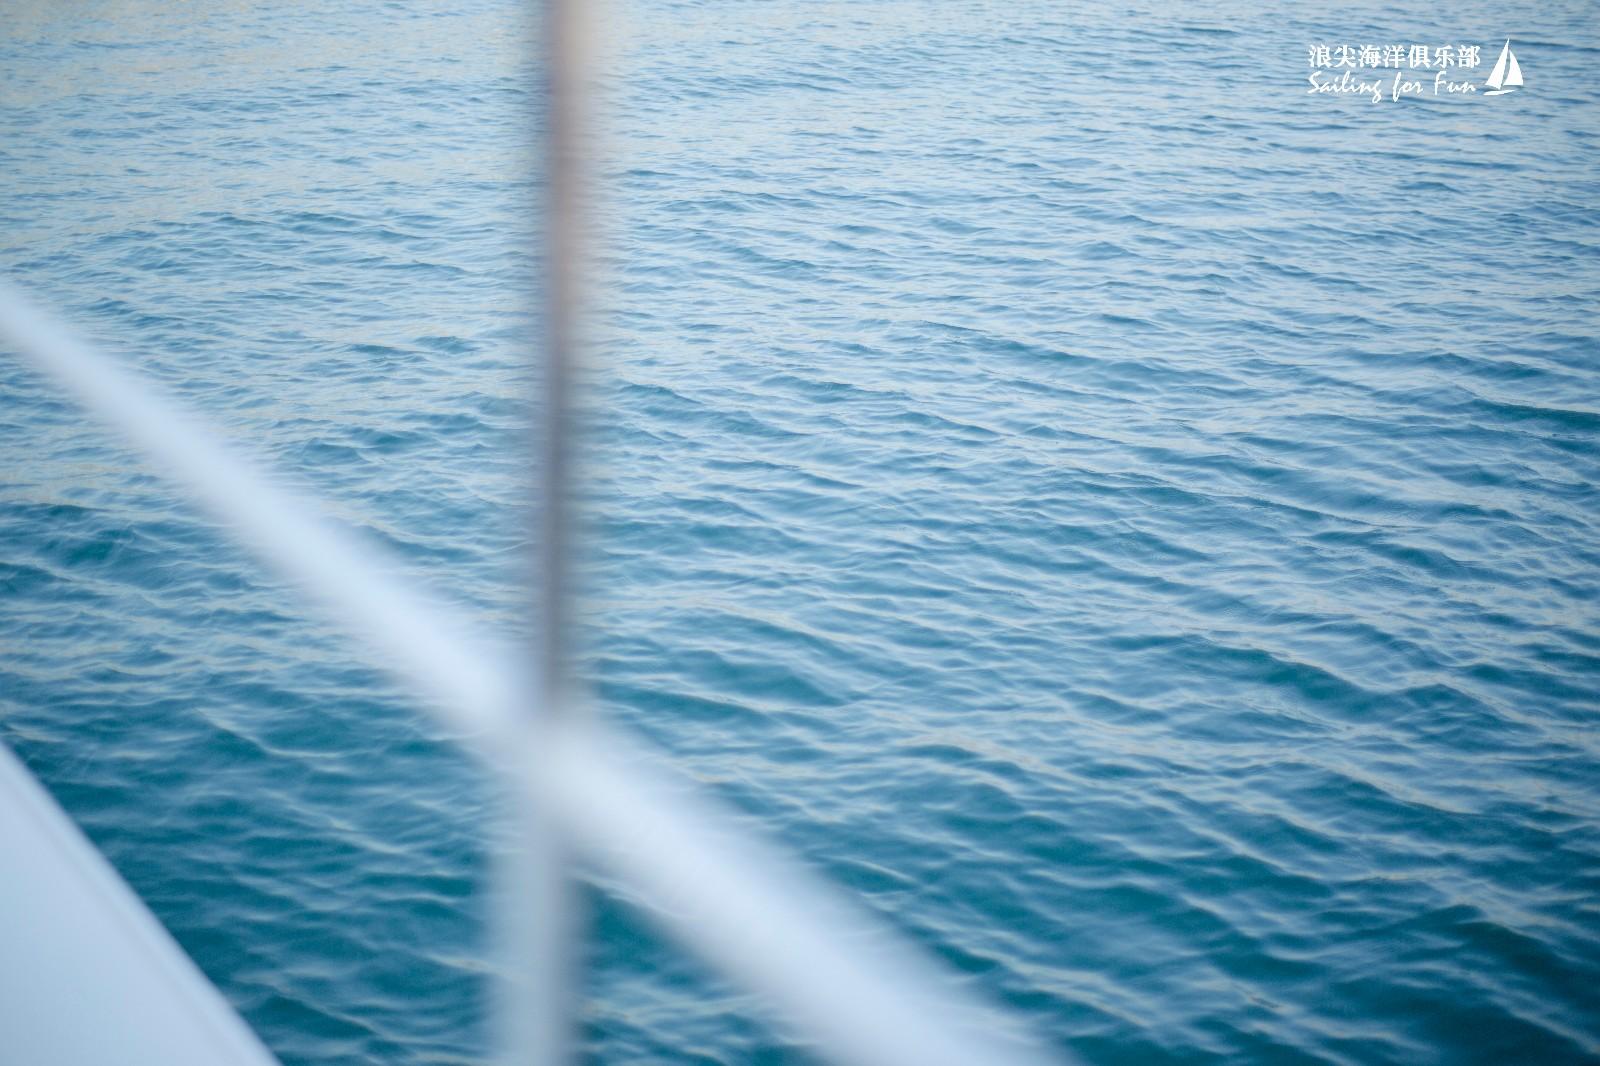 nbsp,出海,游艇,价格,体验 假期来了!豪华双体游艇出海怎么玩?